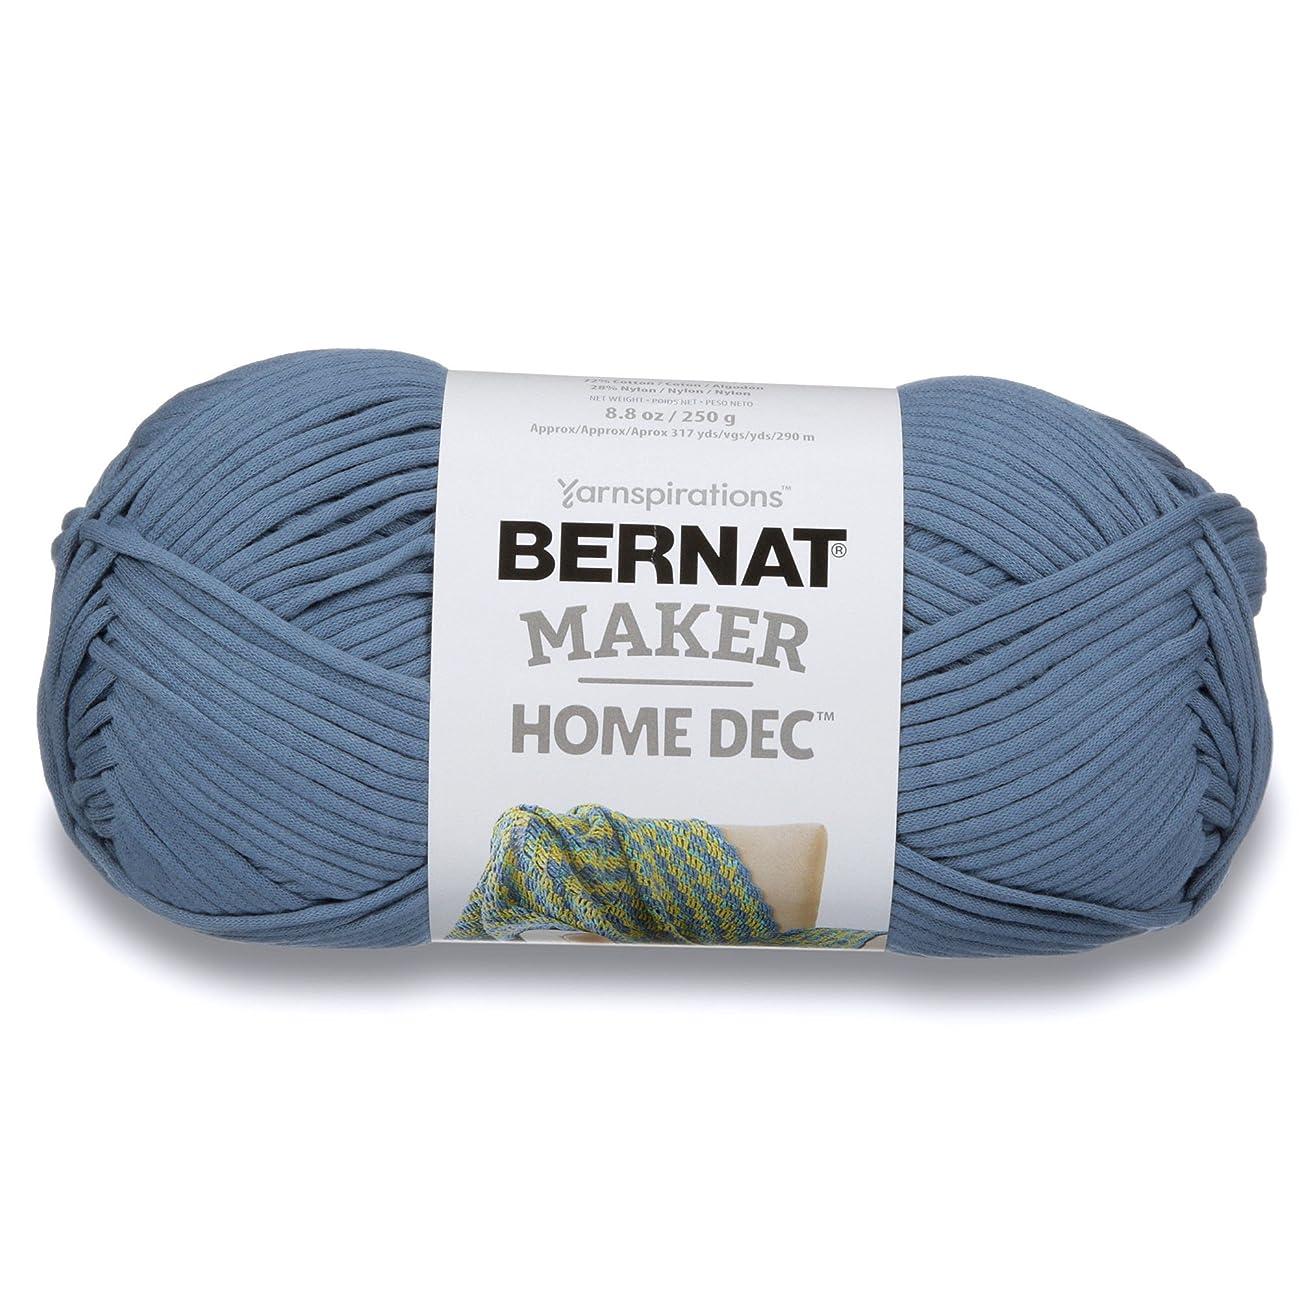 Bernat Maker Home Dec Yarn, 8.8oz, Guage 5 Bulky Chunky, Steel Blue